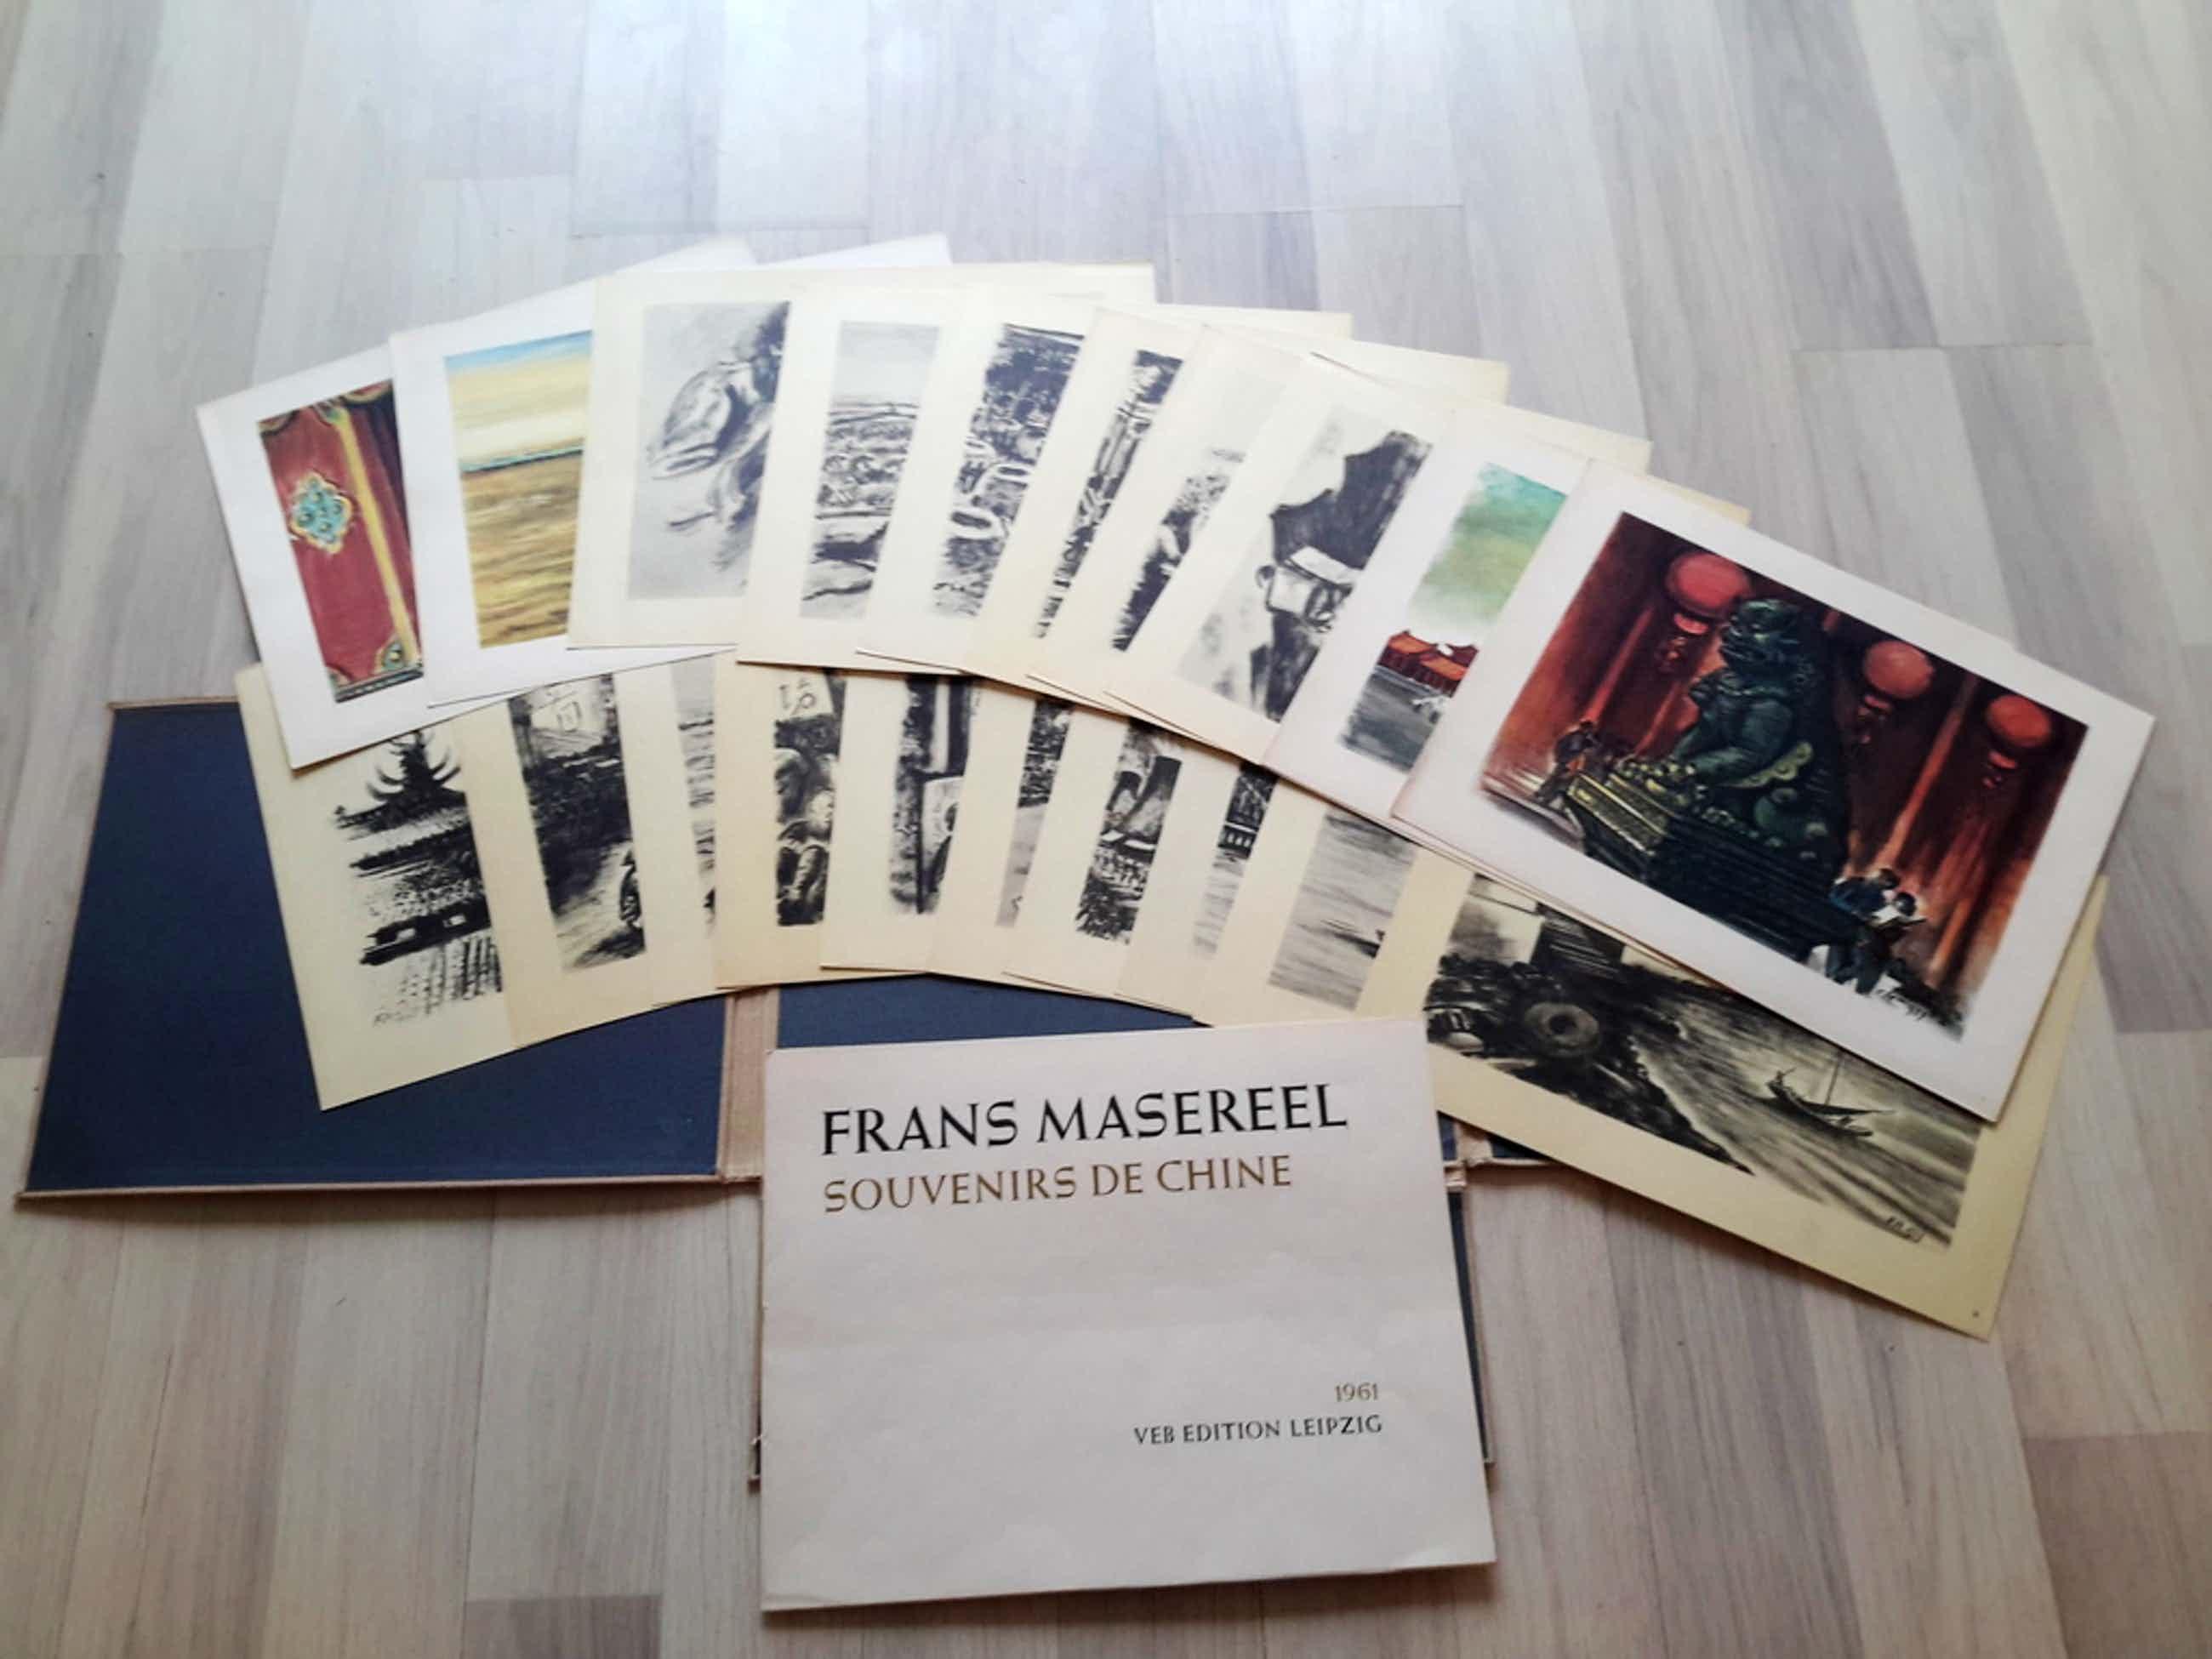 Frans Masereel souvenirs de chine portfolio met 20 prenten van Frans Masereel  kopen? Bied vanaf 50!